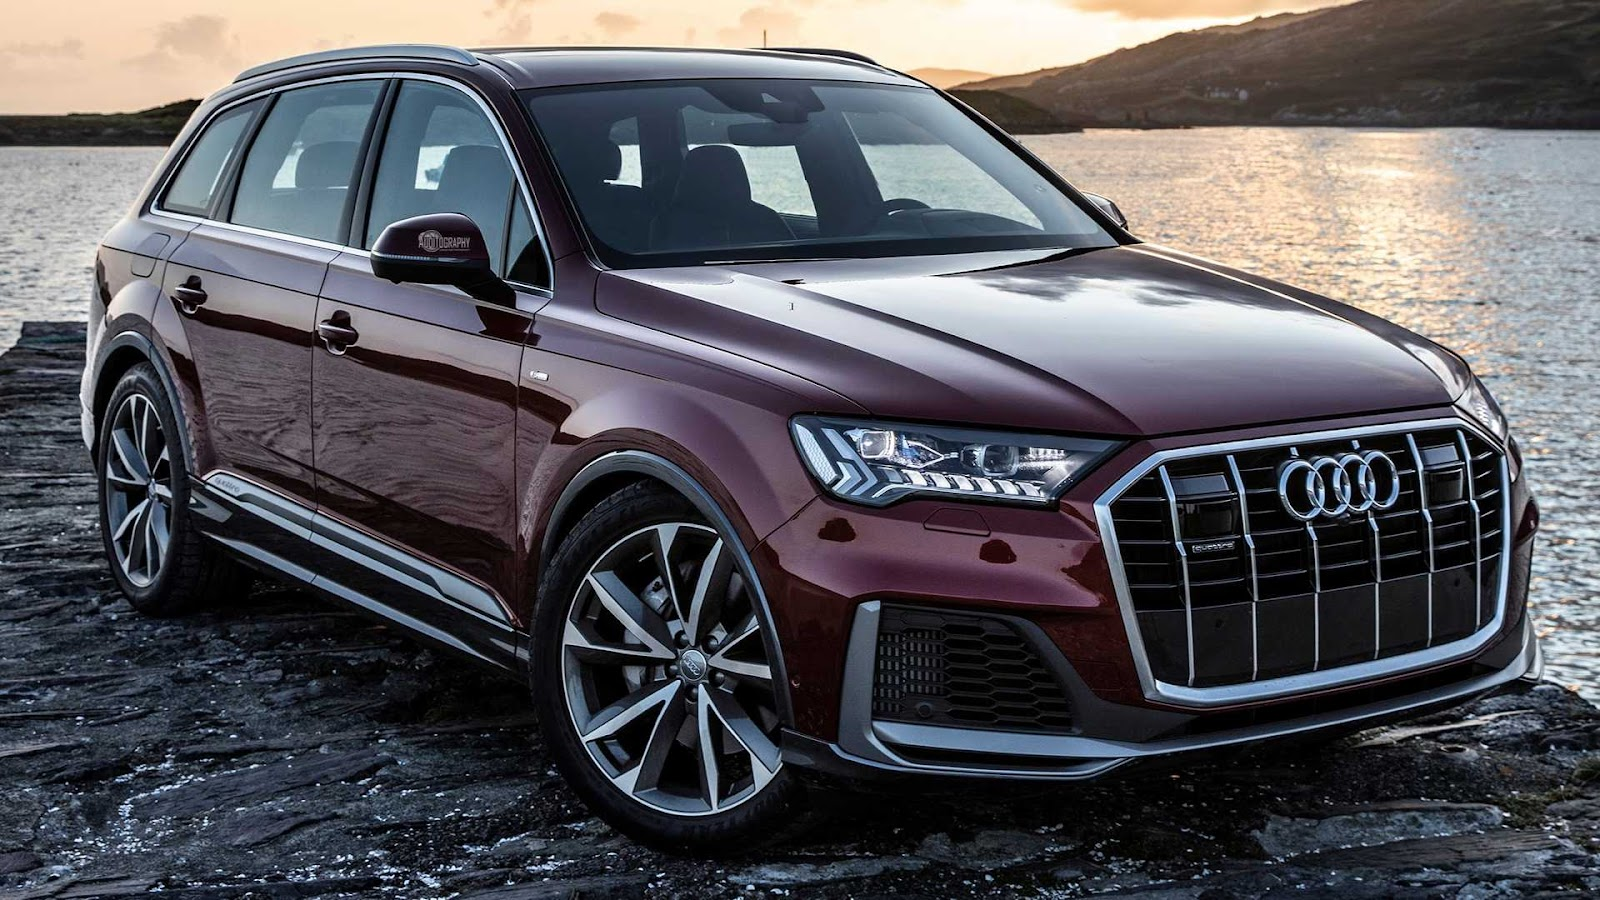 Danh gia xe Audi Q7